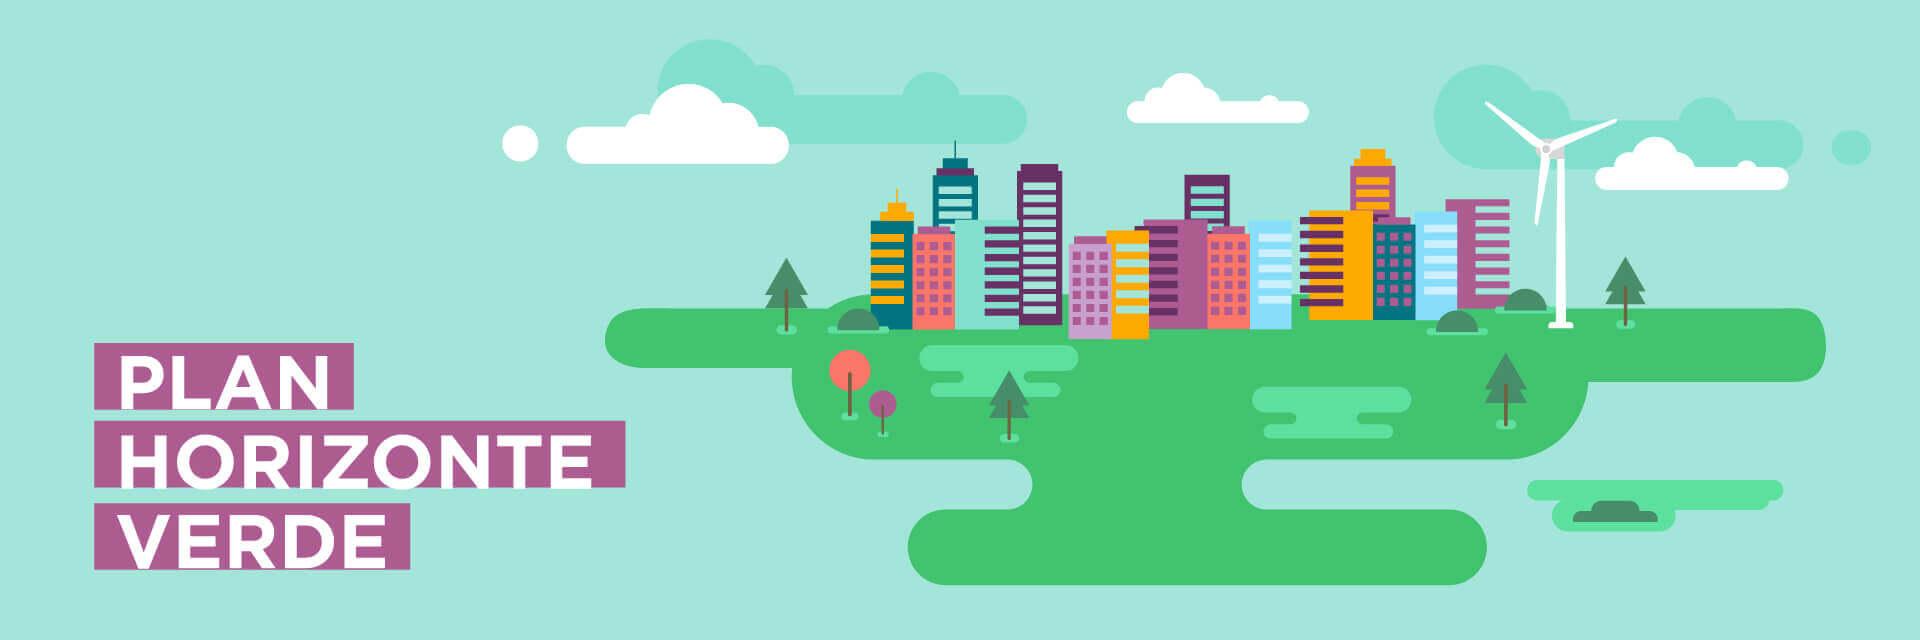 Plan Horizonte Verde